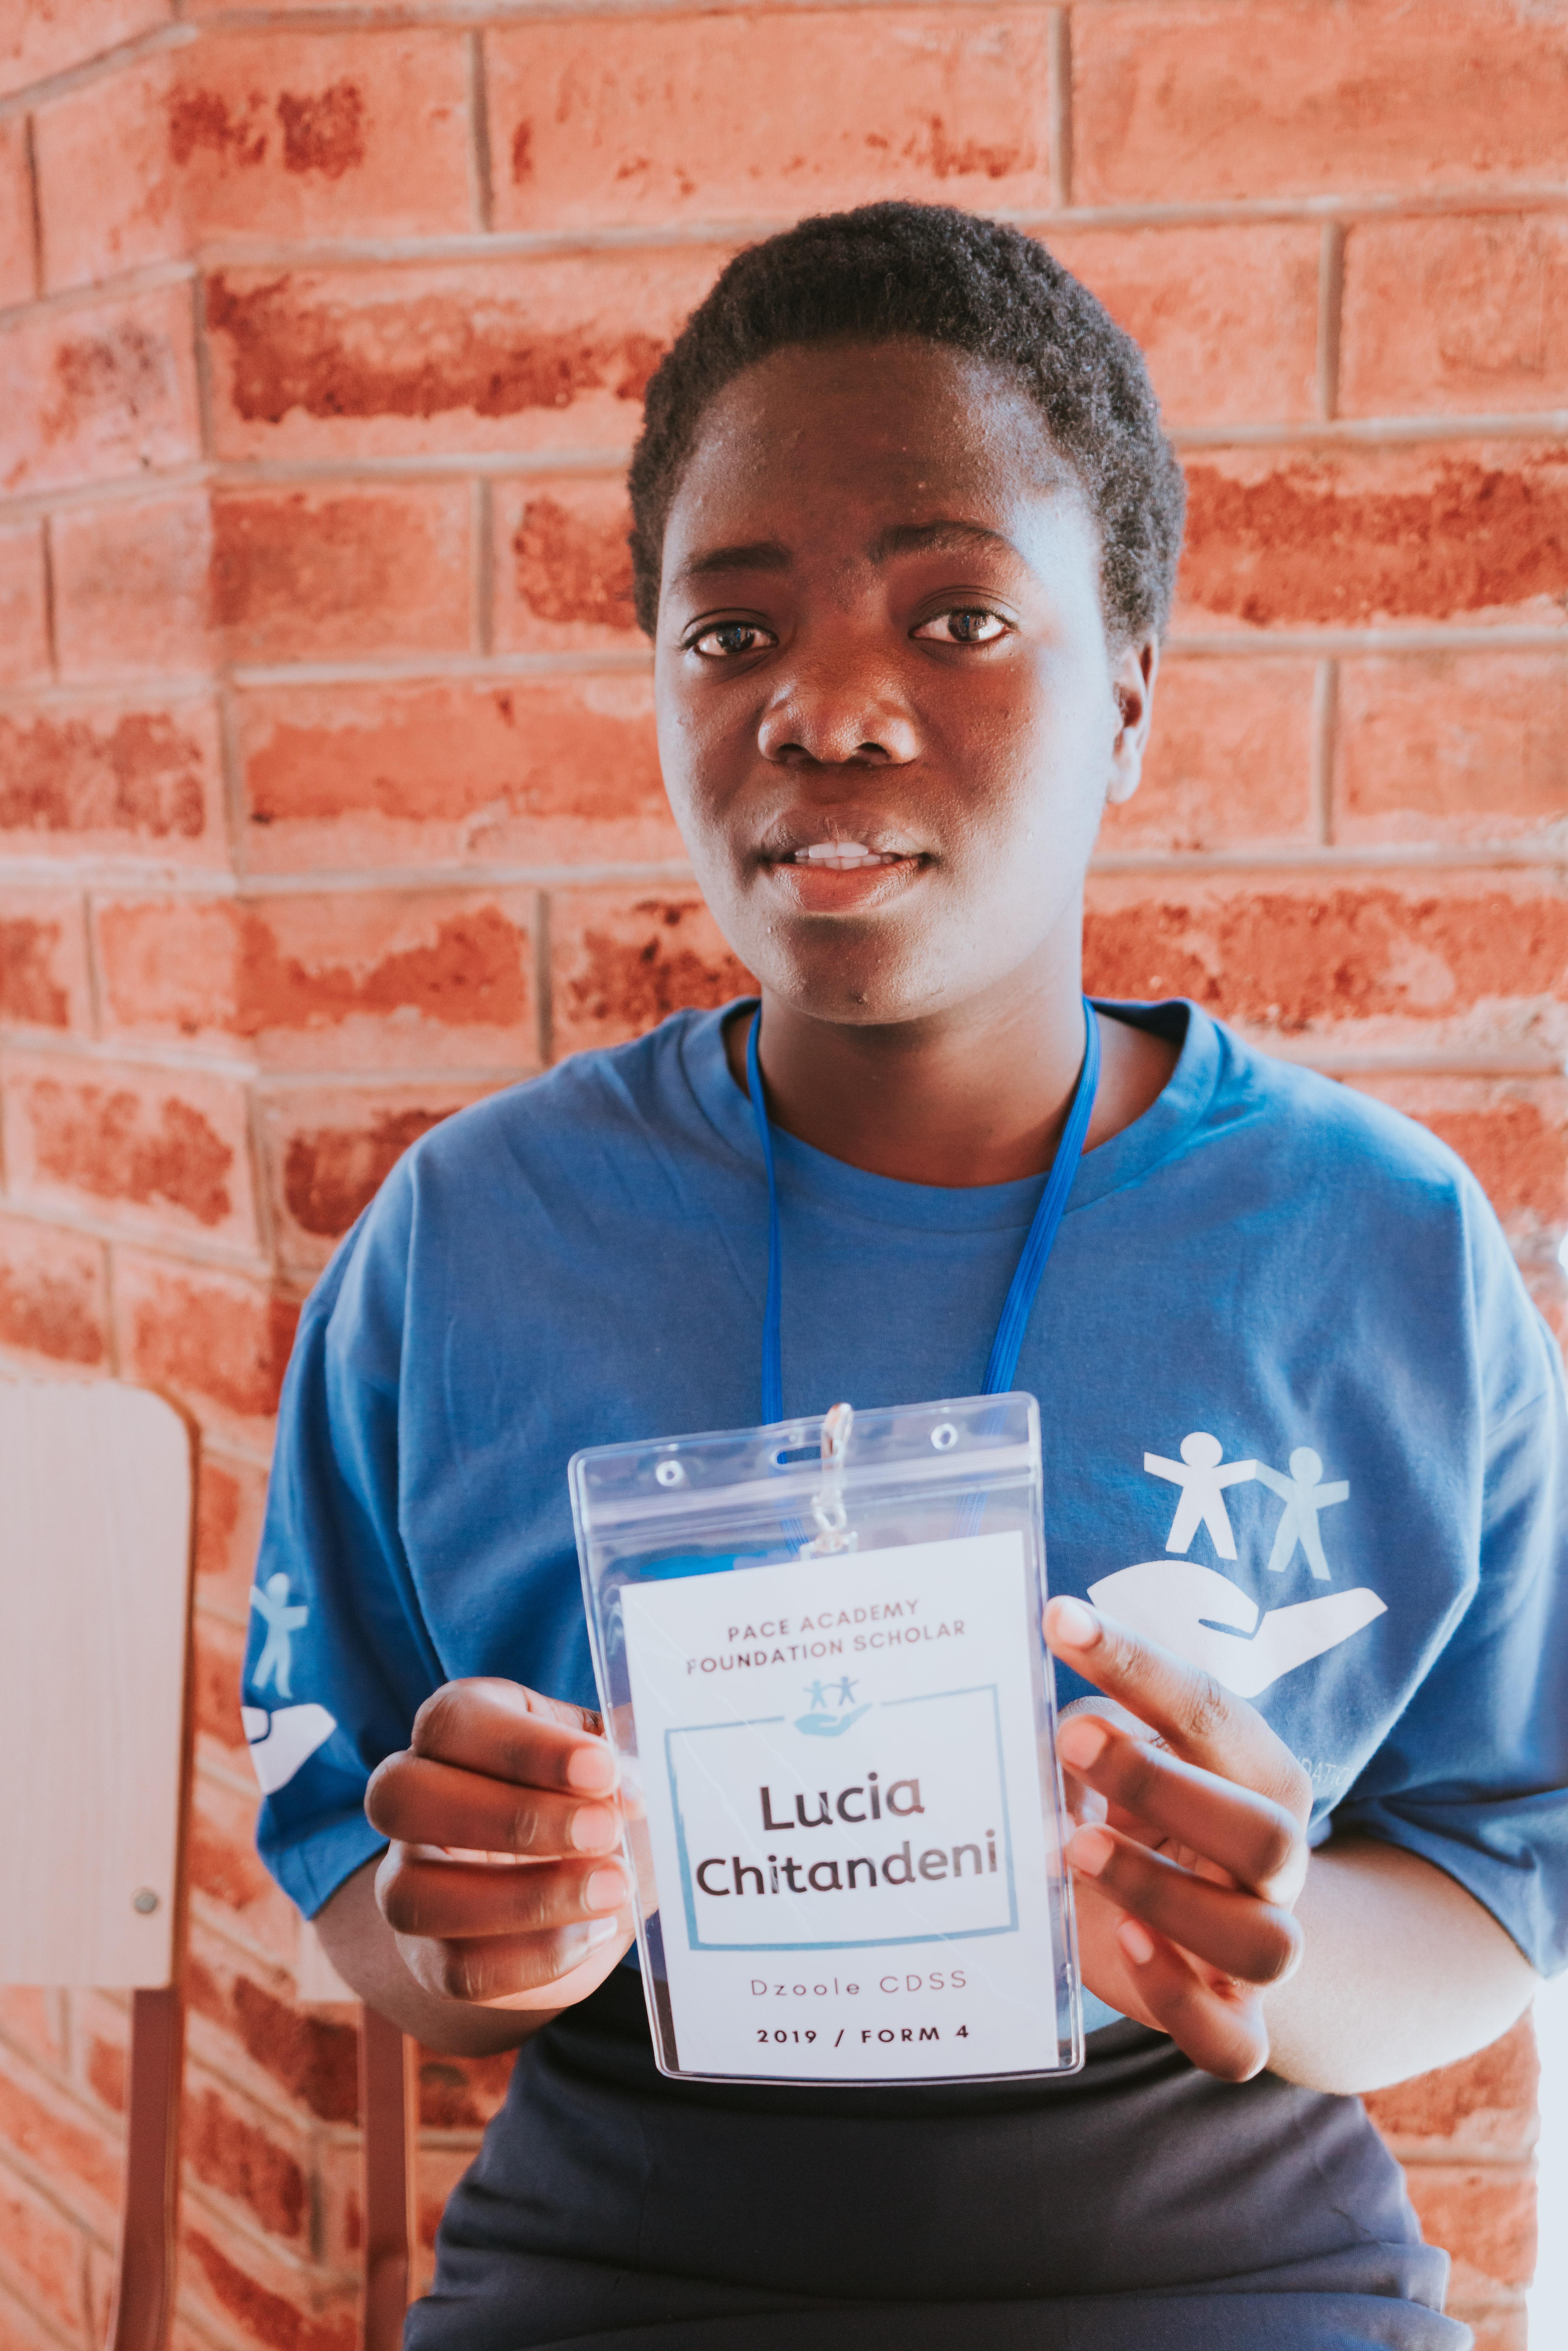 Lucia Chitandeni (Dzoole CDSS)